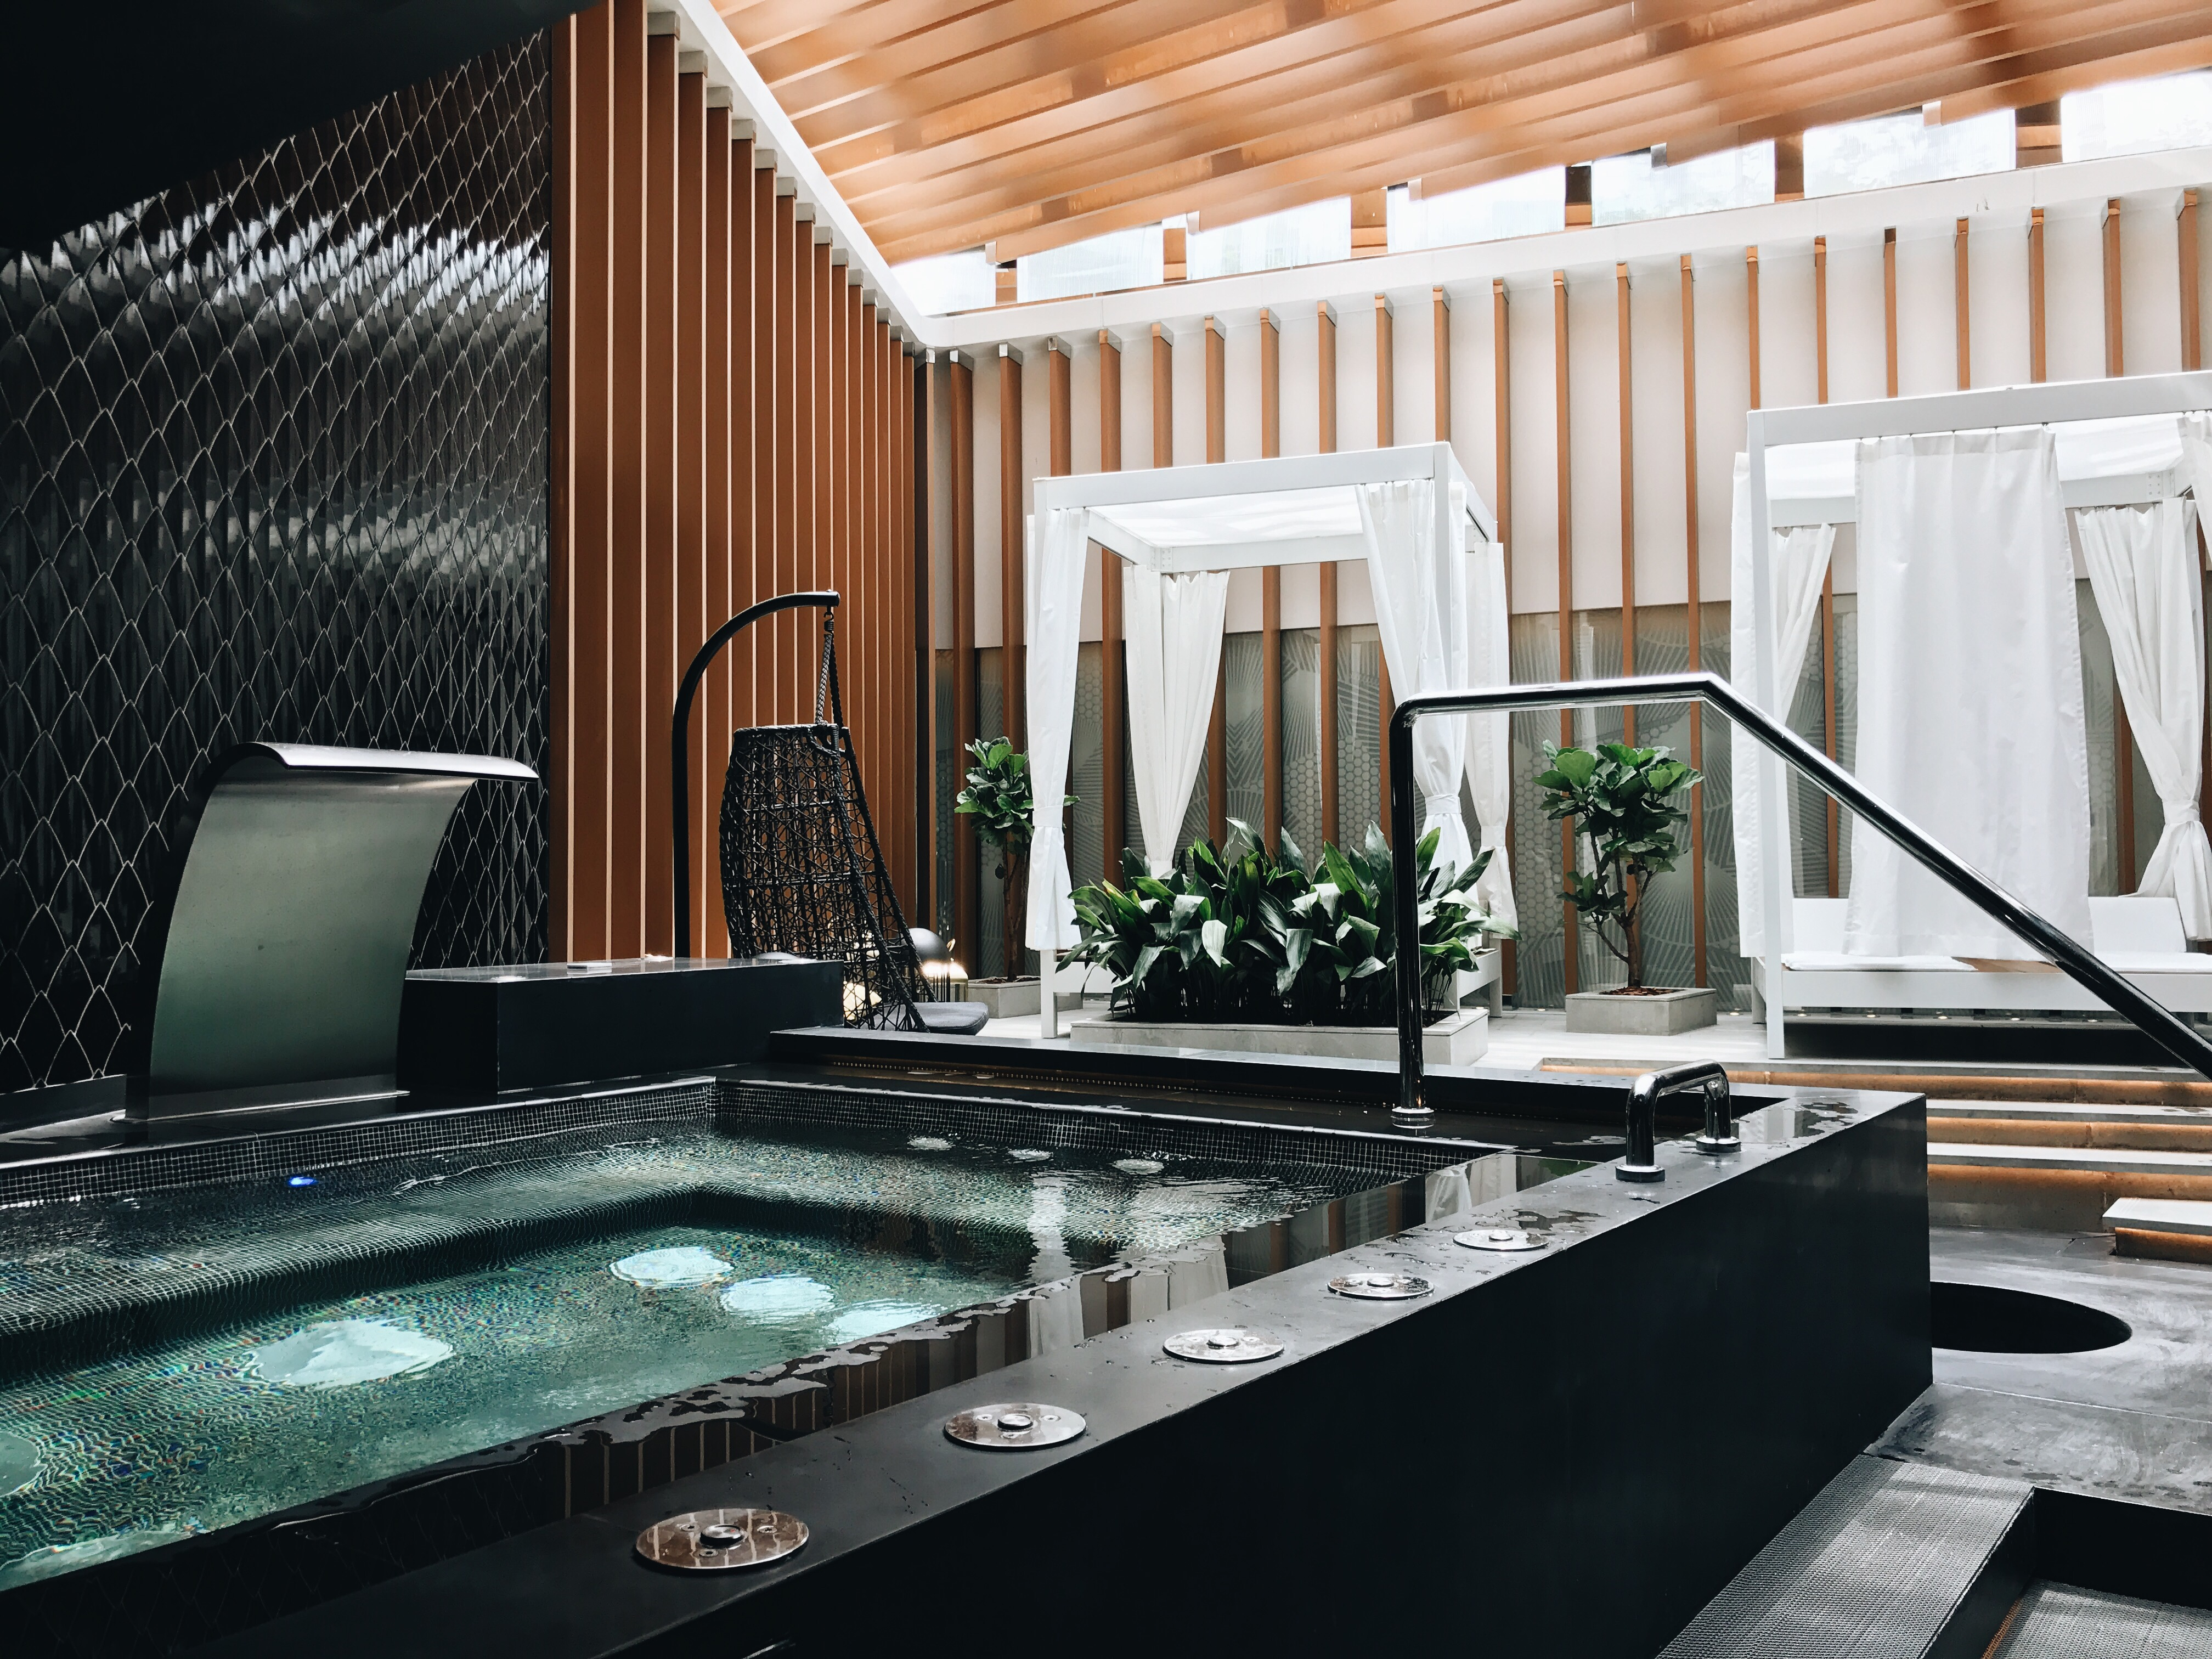 d8cc2aba 3adf 493e 9e77 93efeee764ee - W HOTEL - 上海No.1の景色を楽しむホテル